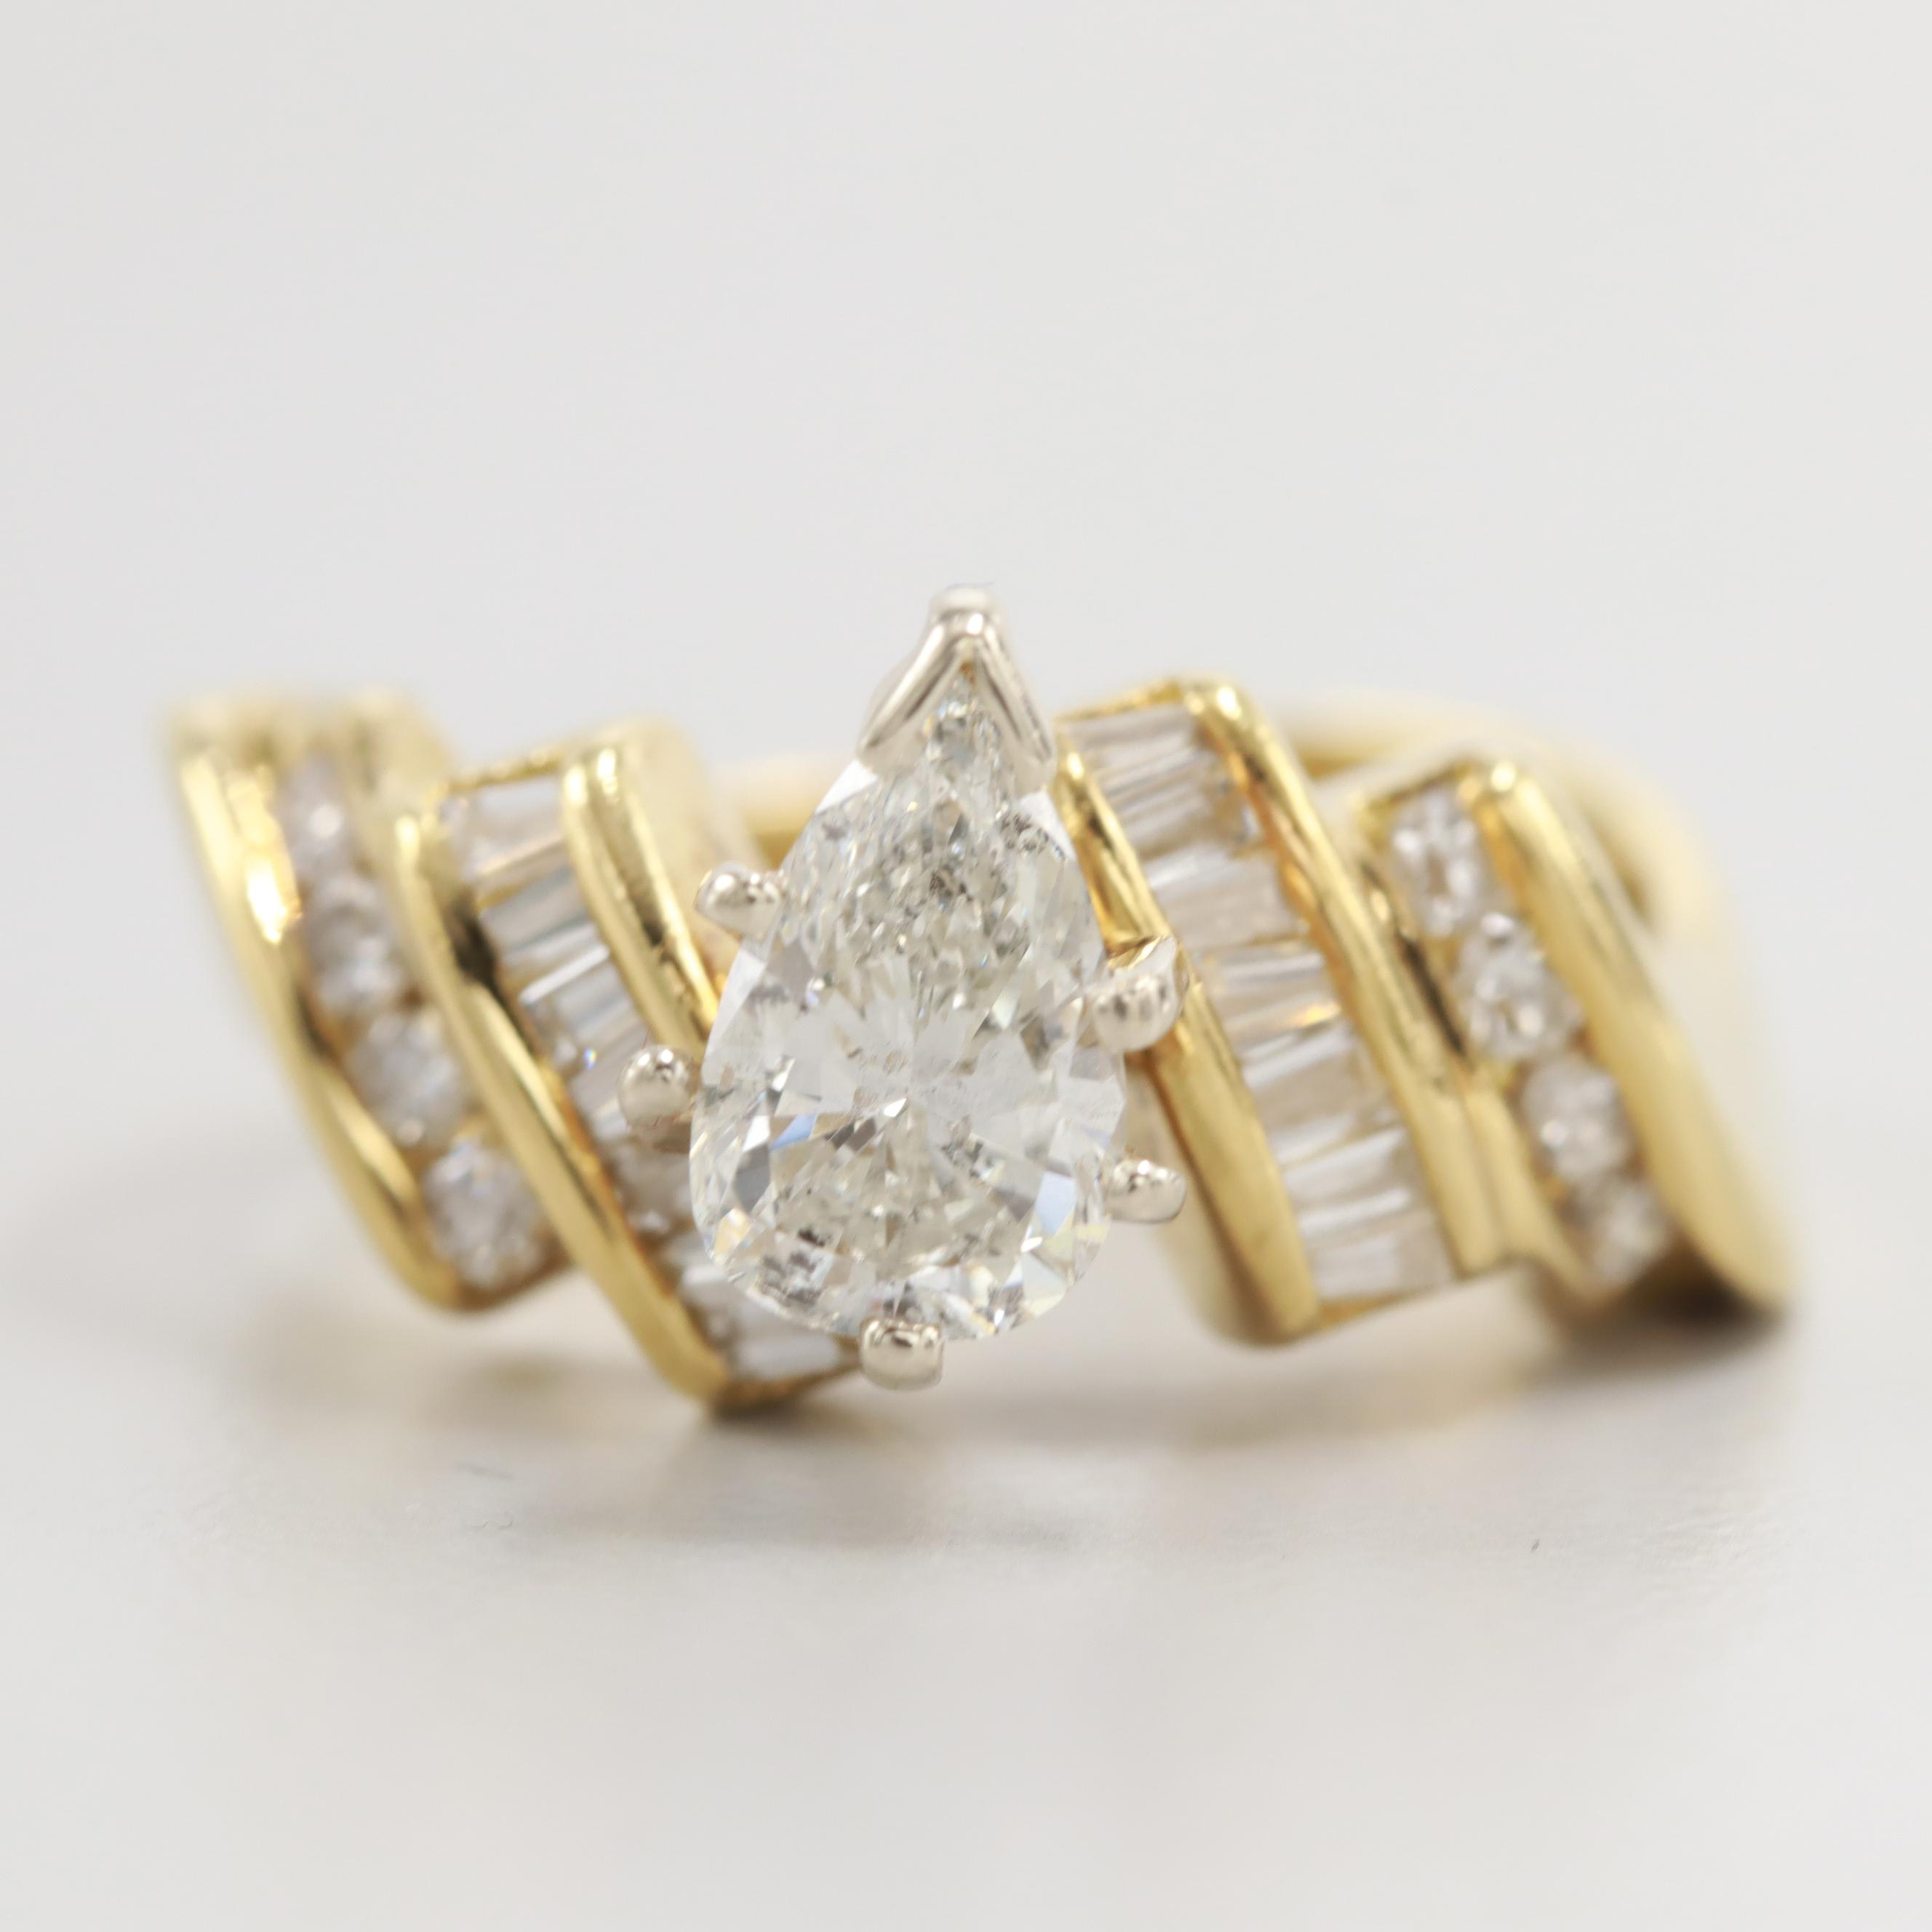 18K Yellow Gold 1.03 CTW Diamond Ring